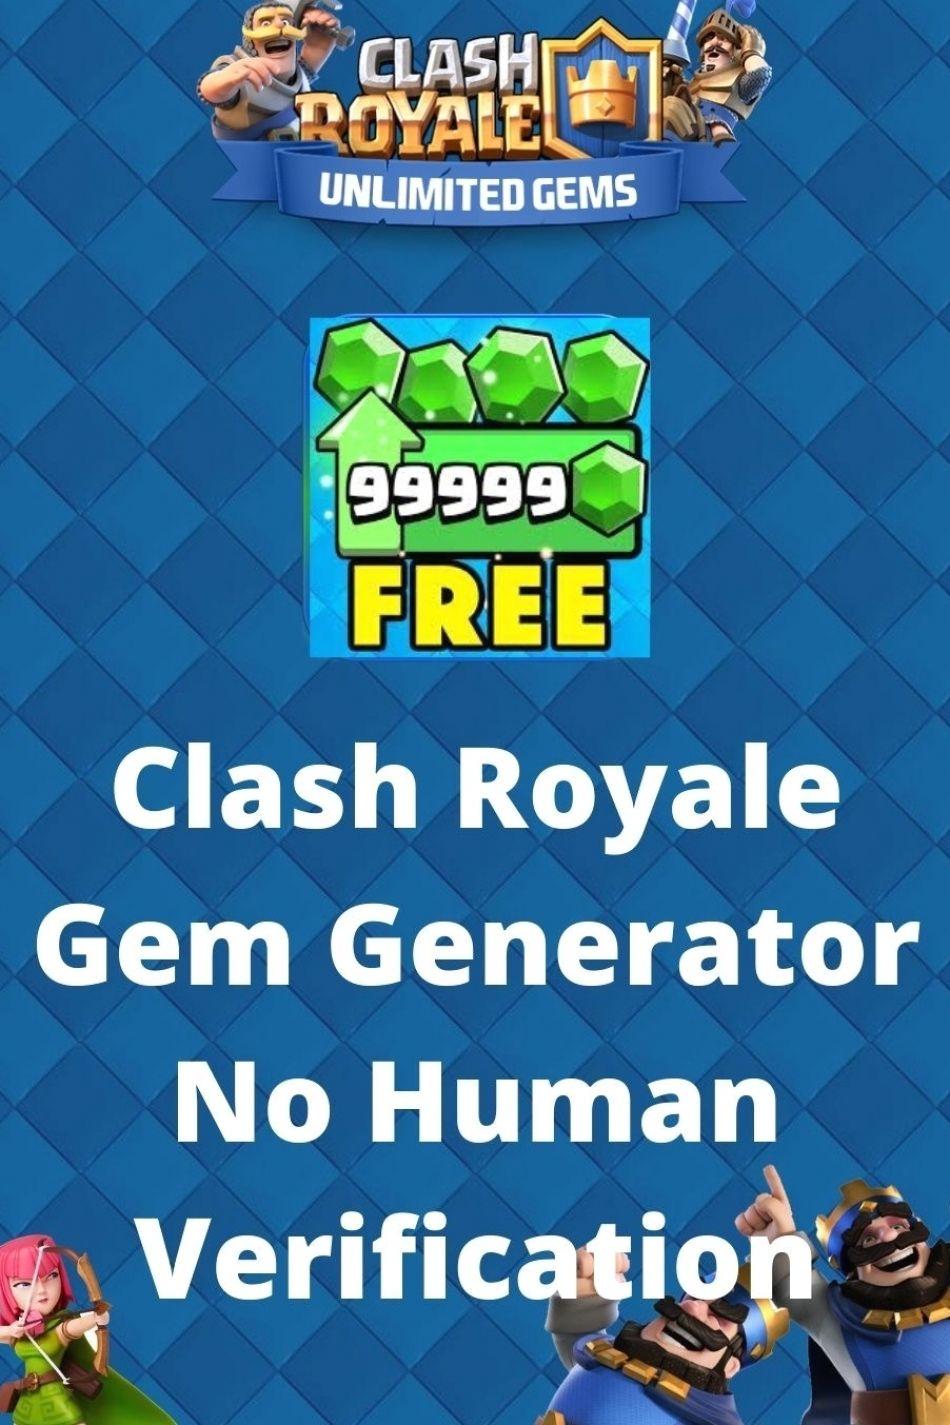 Free Gems Clash Royale No Human Verification